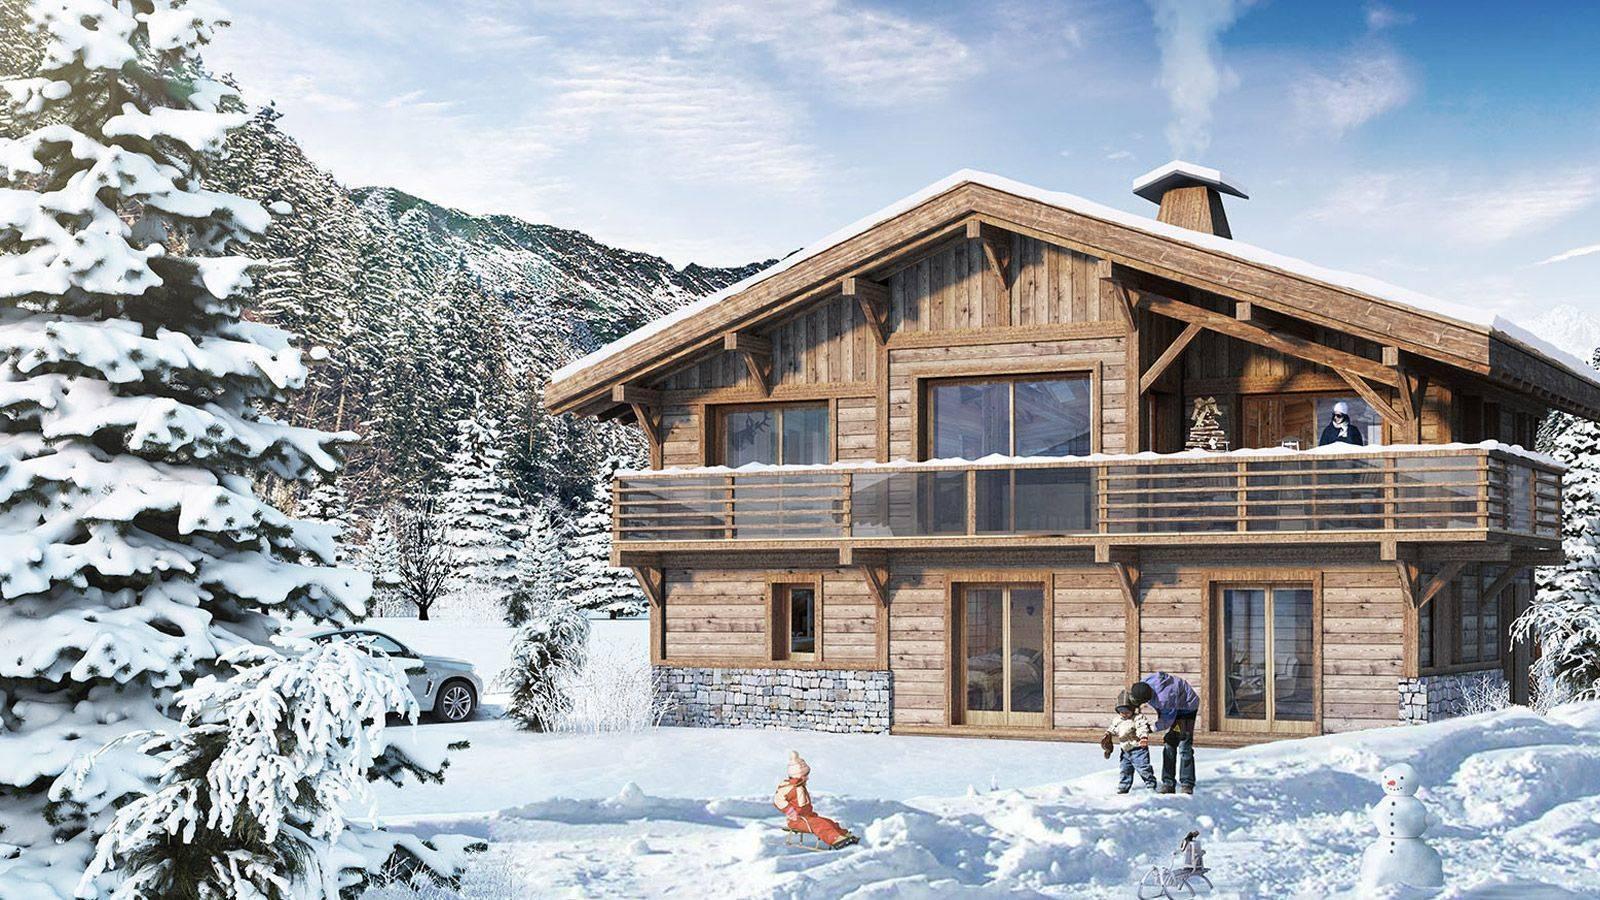 Vente Chalet 154 M² Neuf Chamonix-Mont-Blanc À 74400 1 824 000 € à Vente Chalet Chamonix